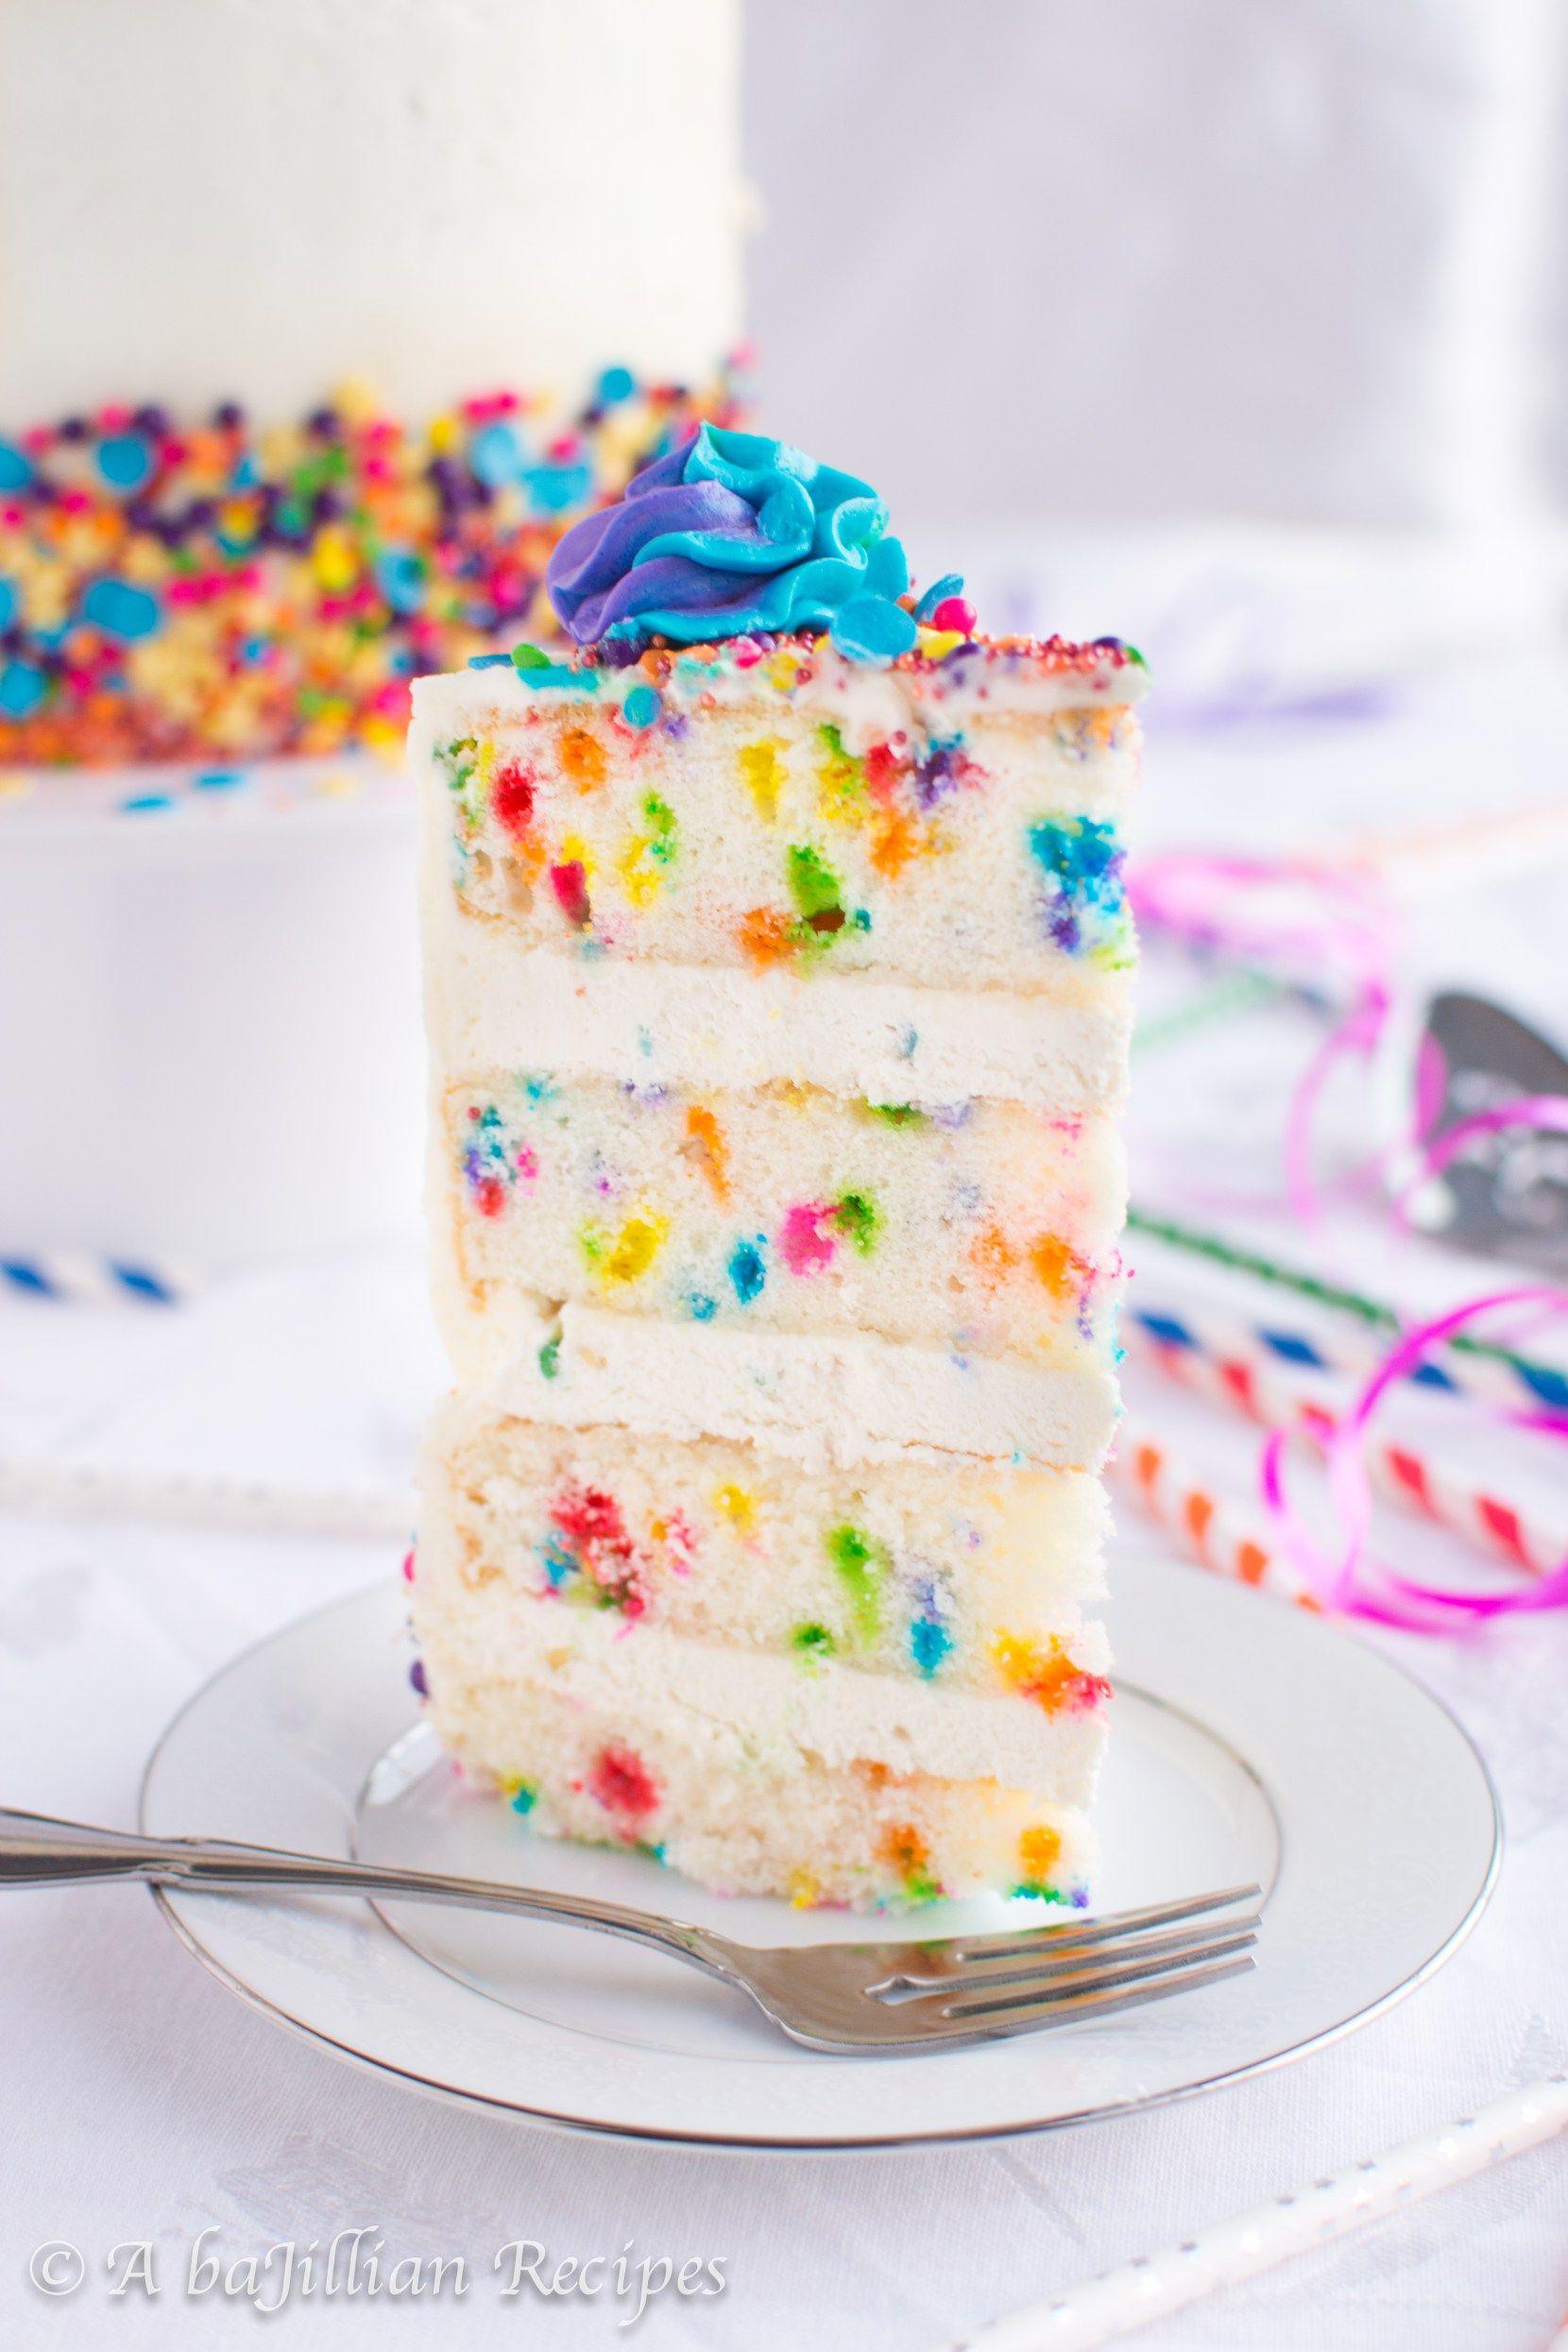 Homemade Funfetti Cake Funfetti Cake Mix Recipes Homemade